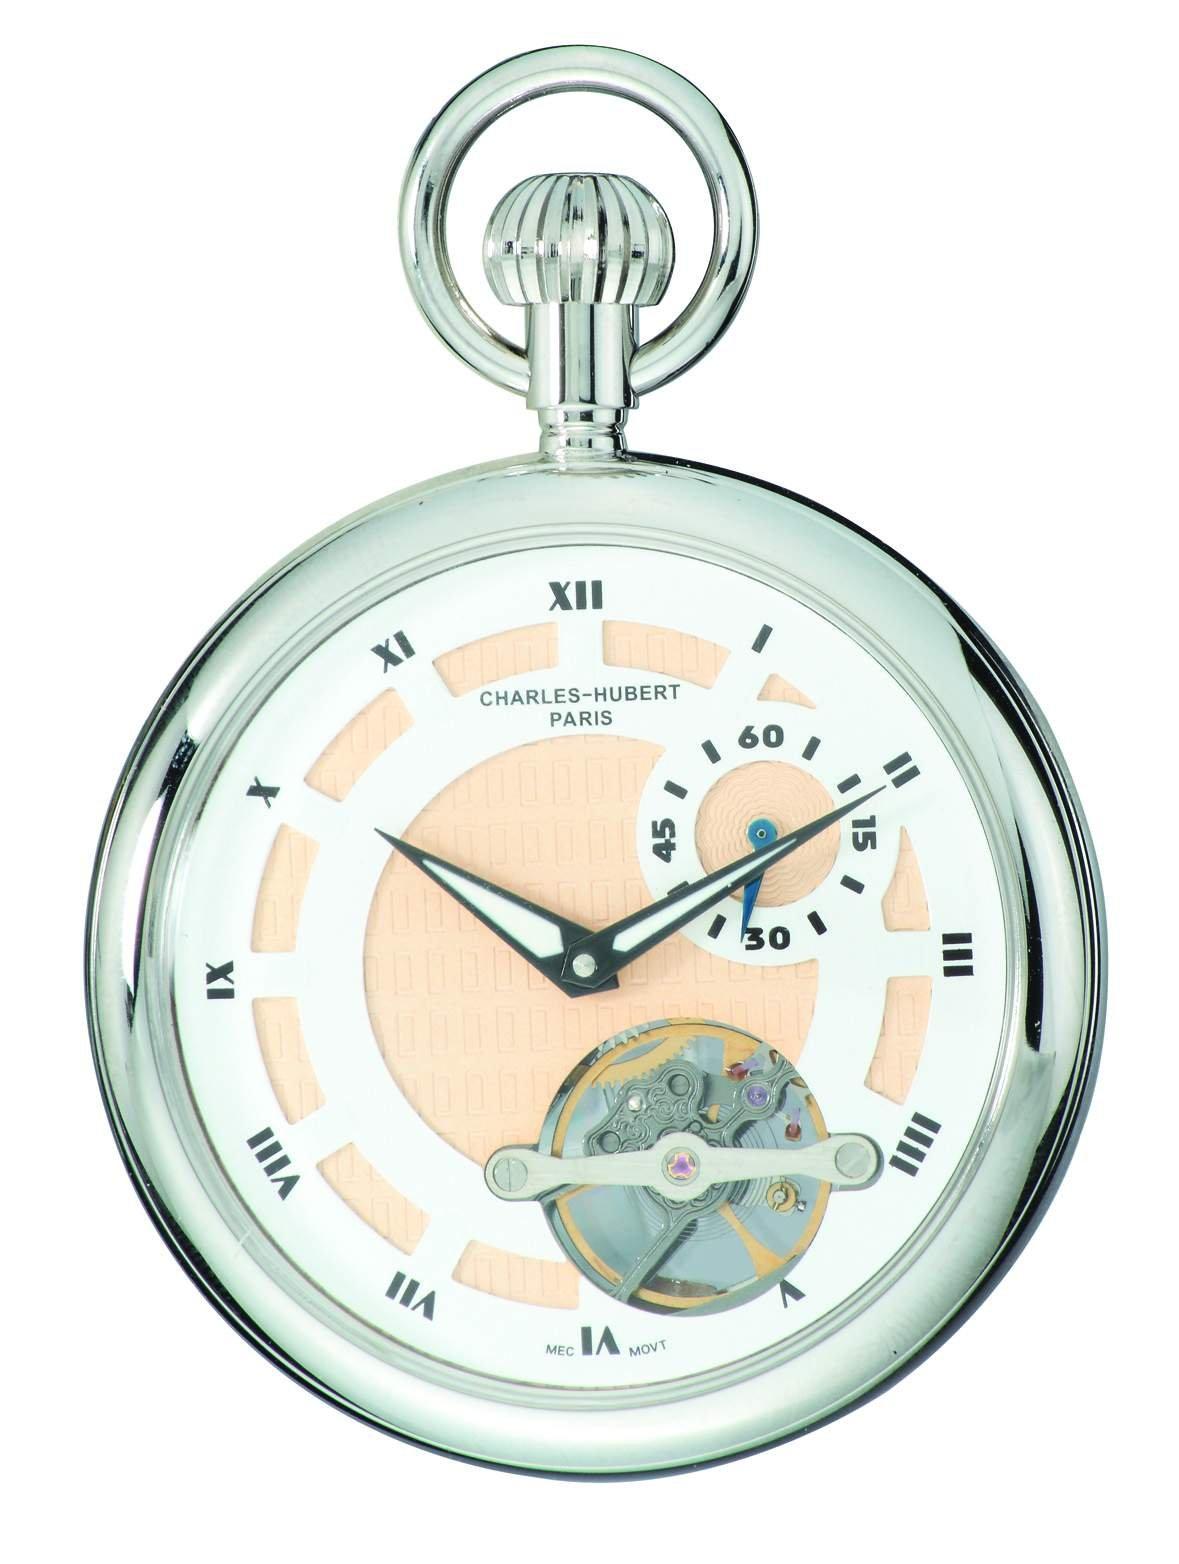 Charles-Hubert, Paris 3901-W Classic Collection Open Face Mechanical Pocket Watch